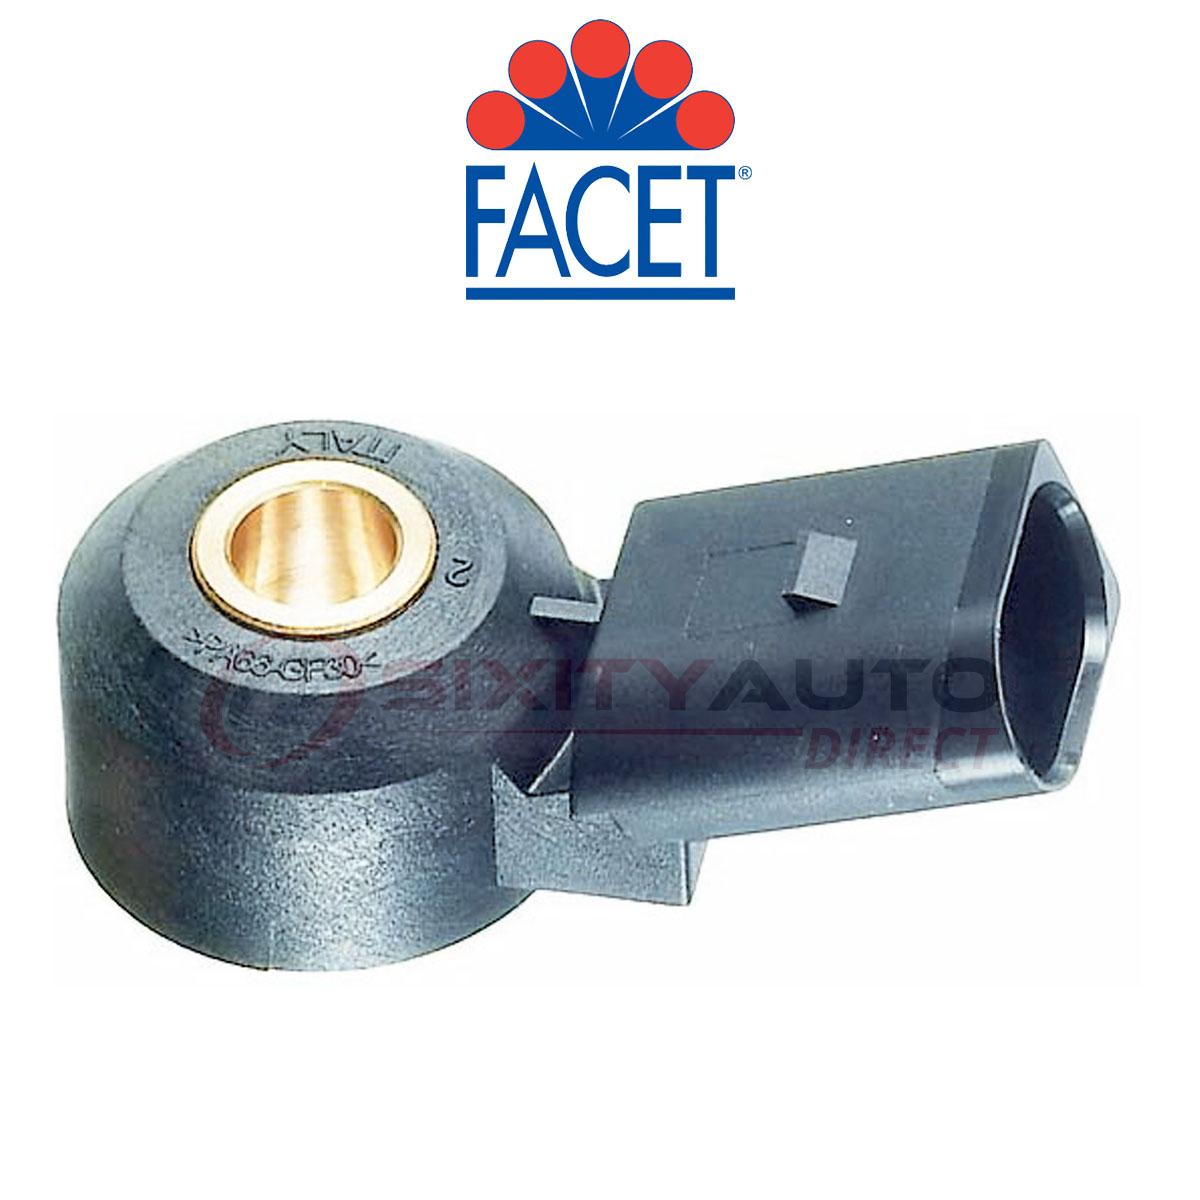 Facet 9.3141 Ignition Knock Detonation Sensor for 1 132 002 1N1A-12A699-AA vg